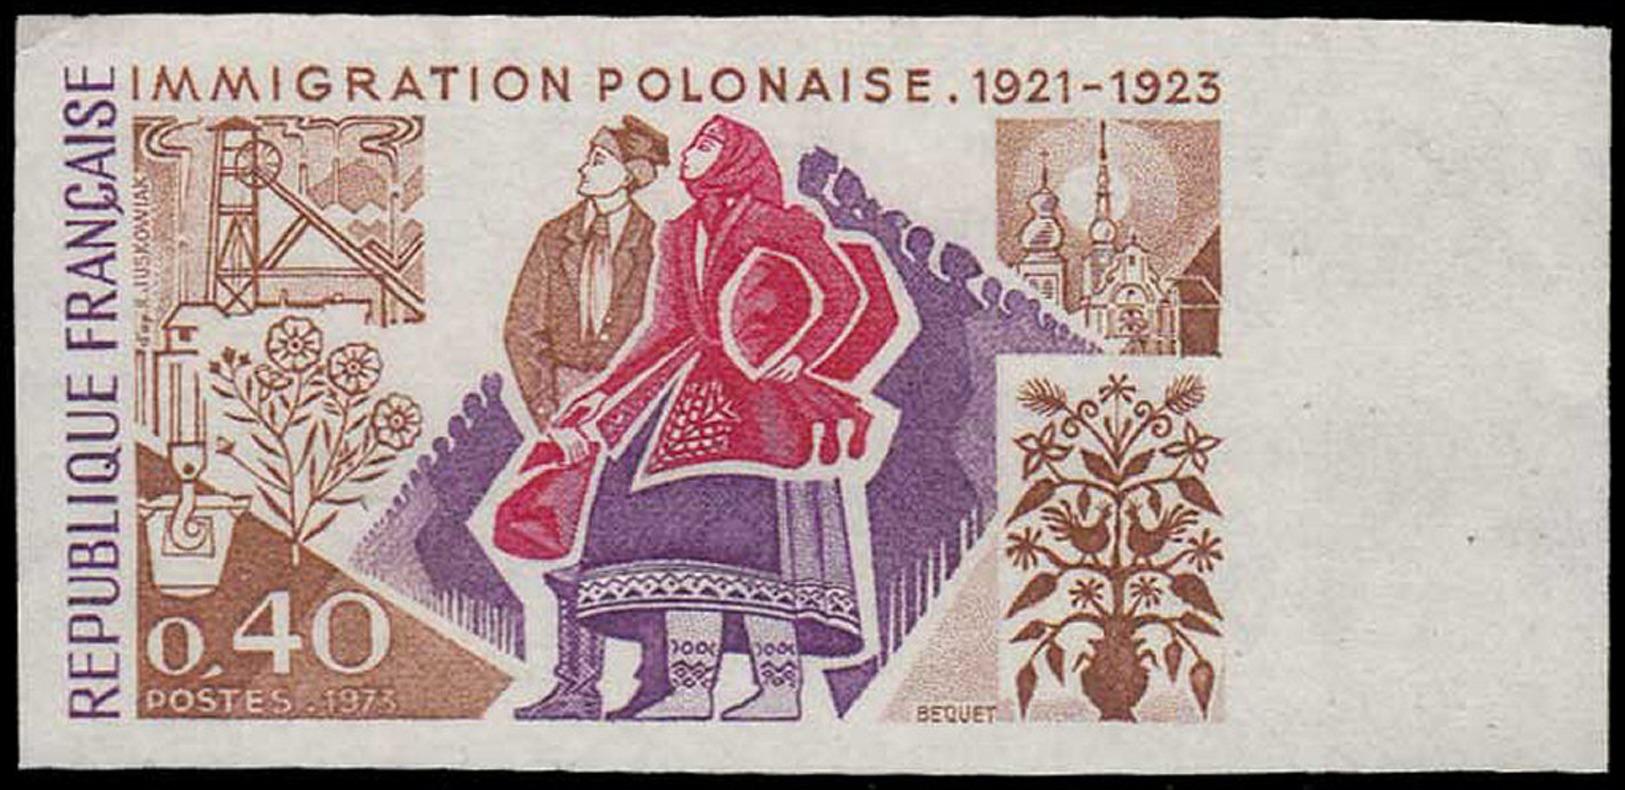 FRANCE Essais  1740 Essai En Polychrome: Immigration Polonaise - Proofs